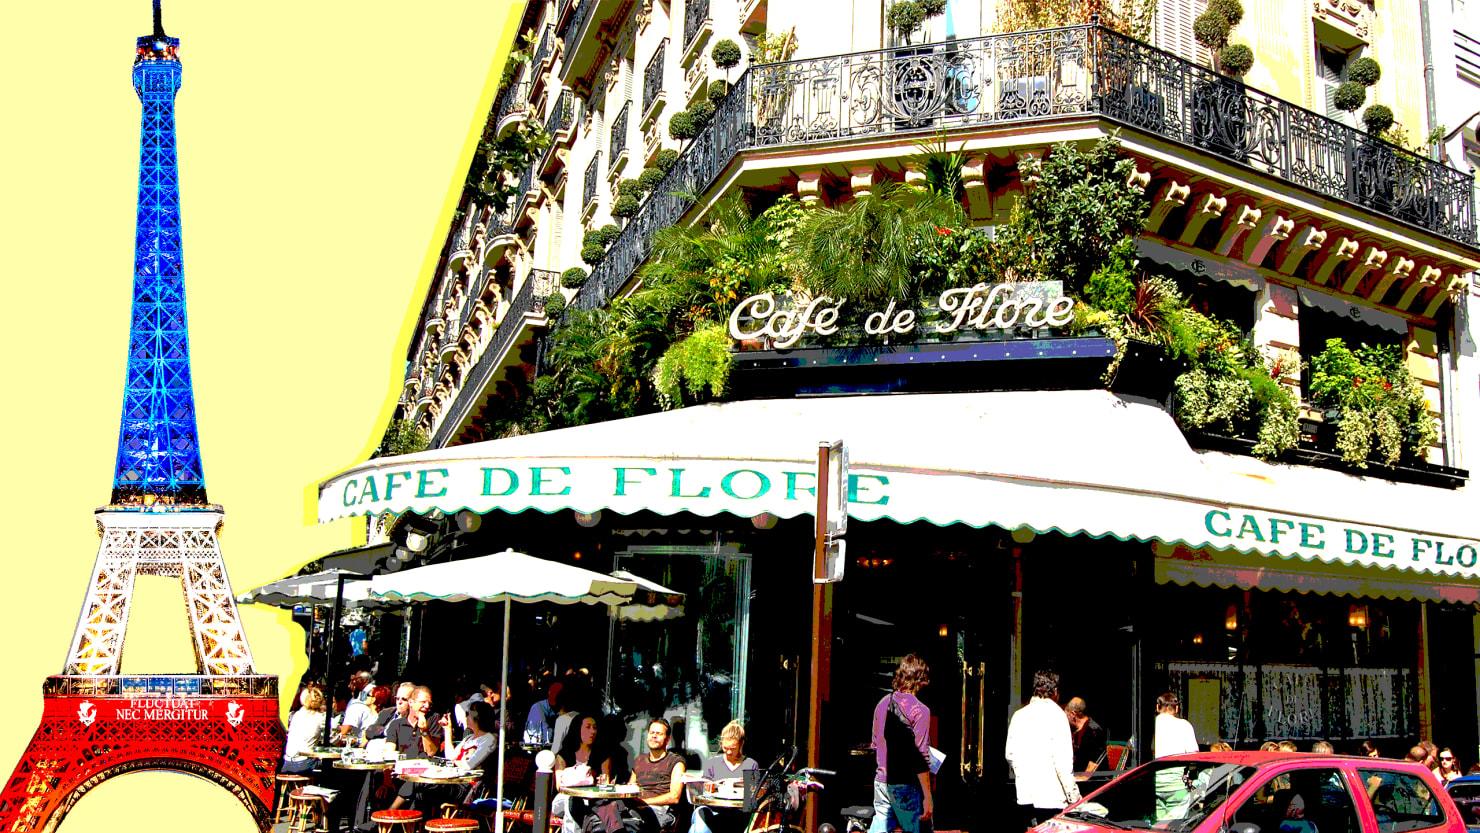 Sartre Spinoza And Cruising At The Cafe De Flore - Fotos-de-flore